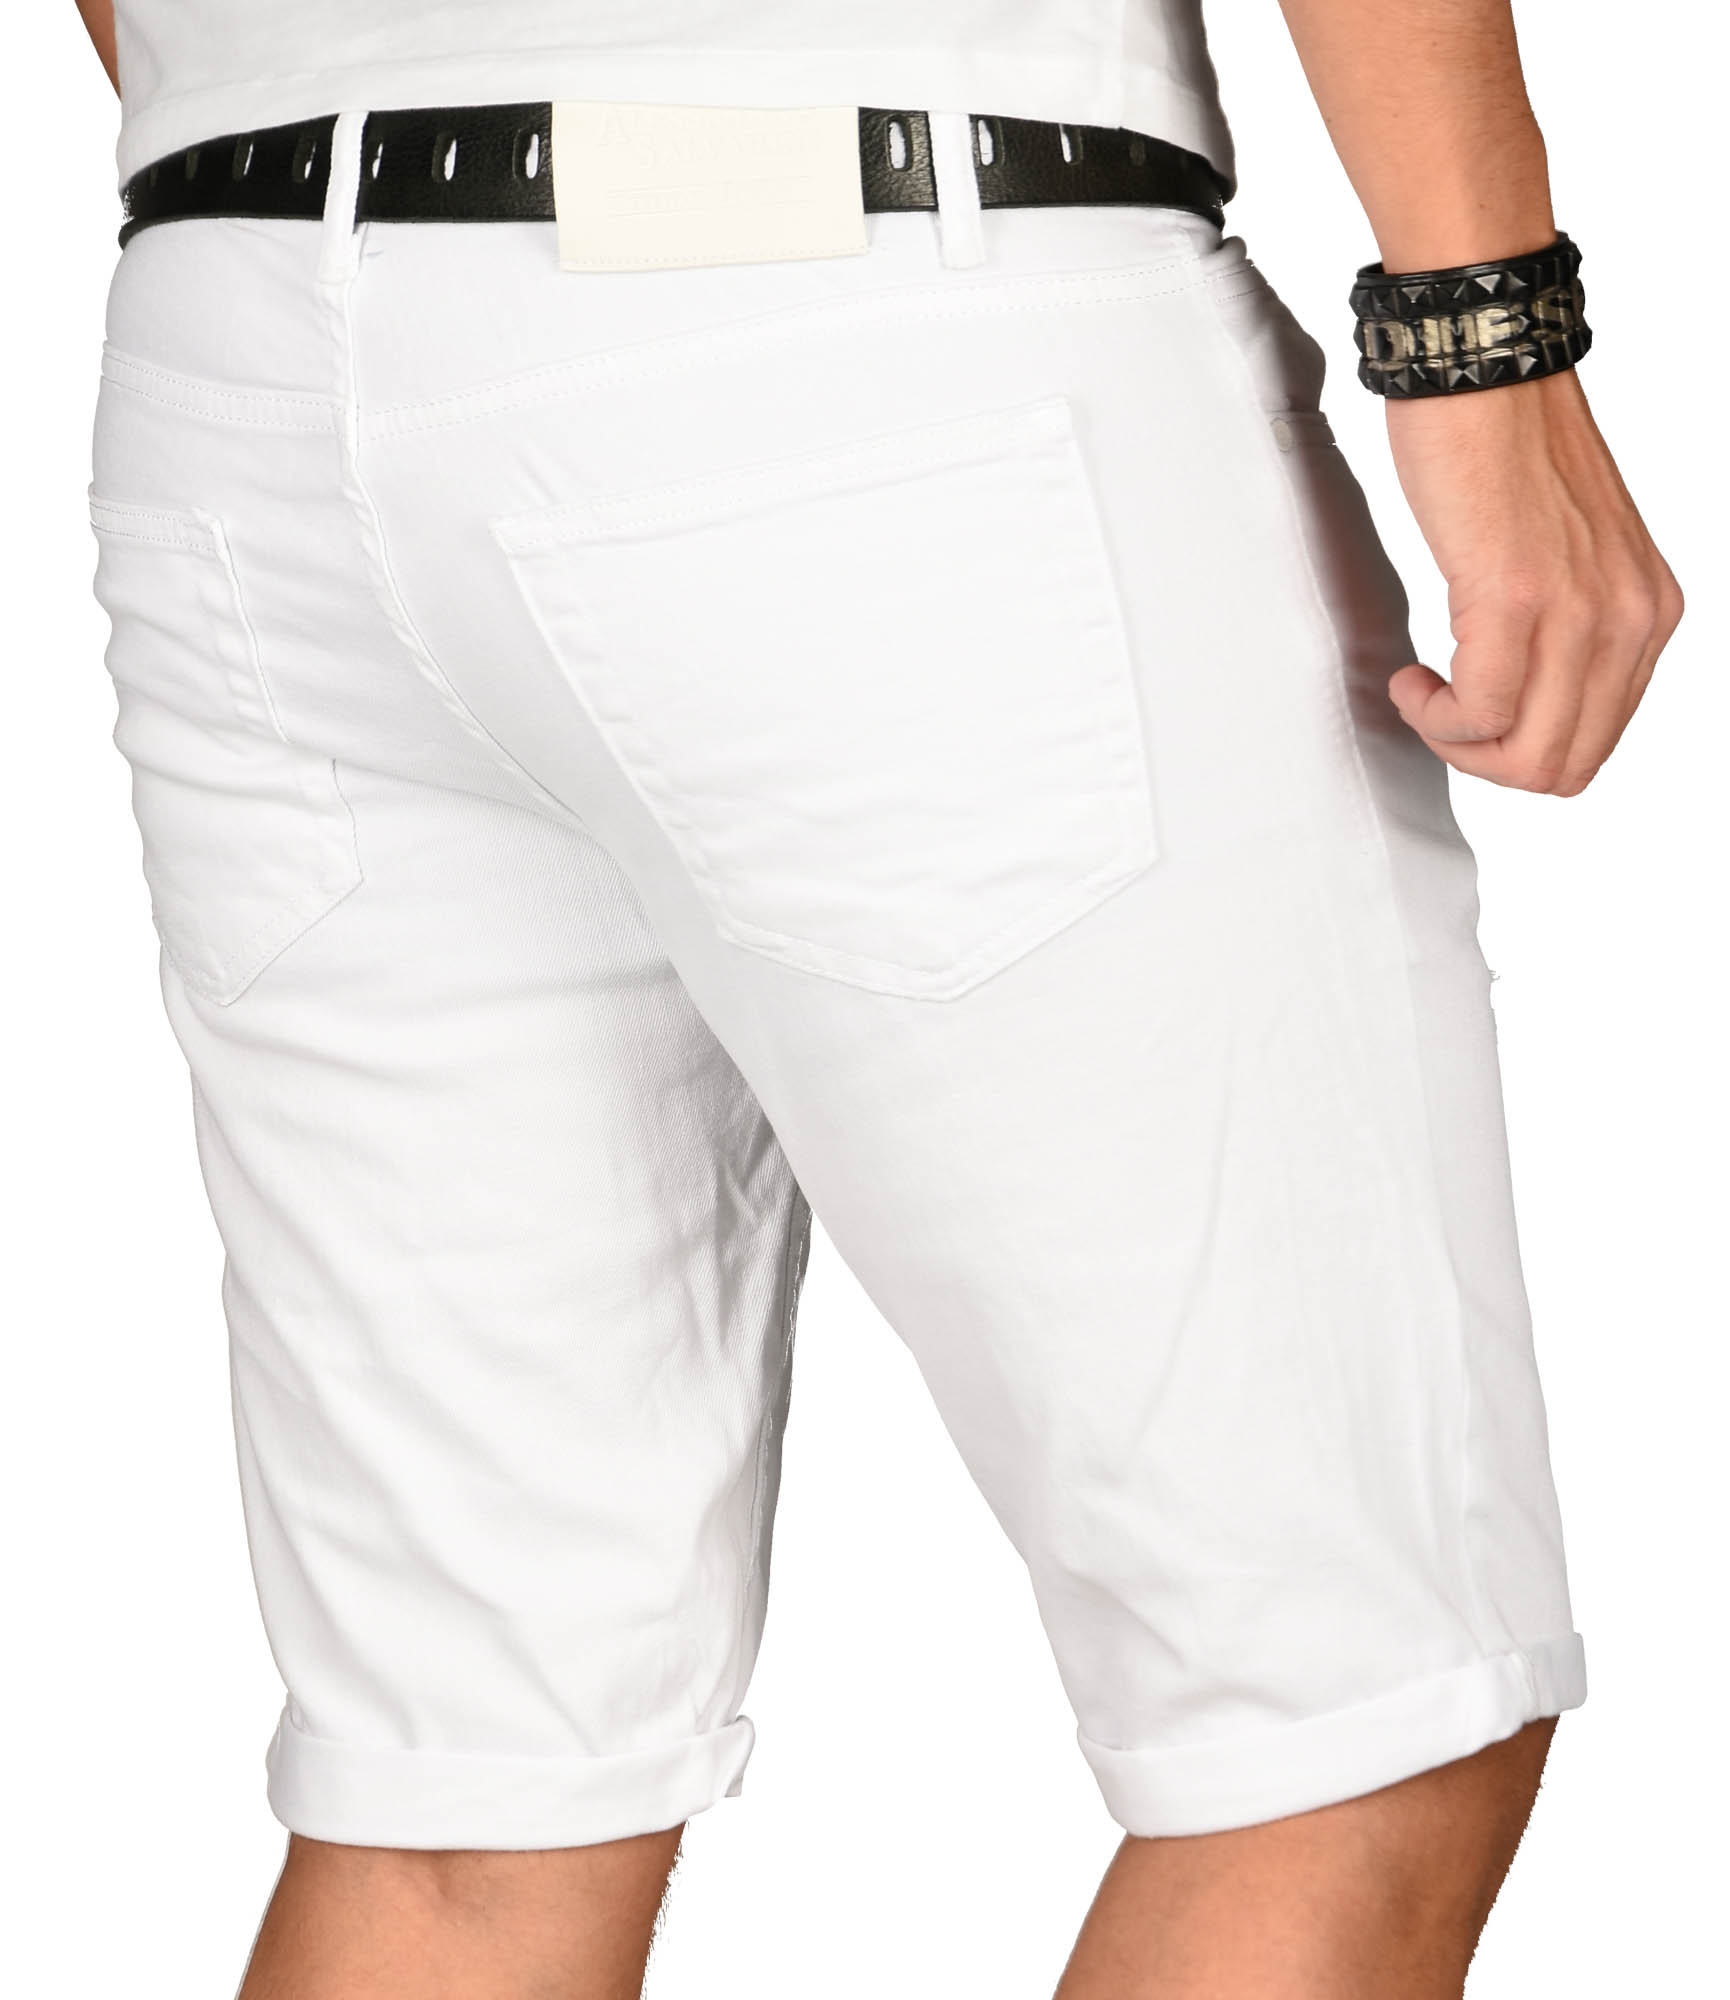 A-Salvarini-Herren-Designer-Jeans-Short-kurze-Hose-Slim-Sommer-Shorts-Washed Indexbild 4